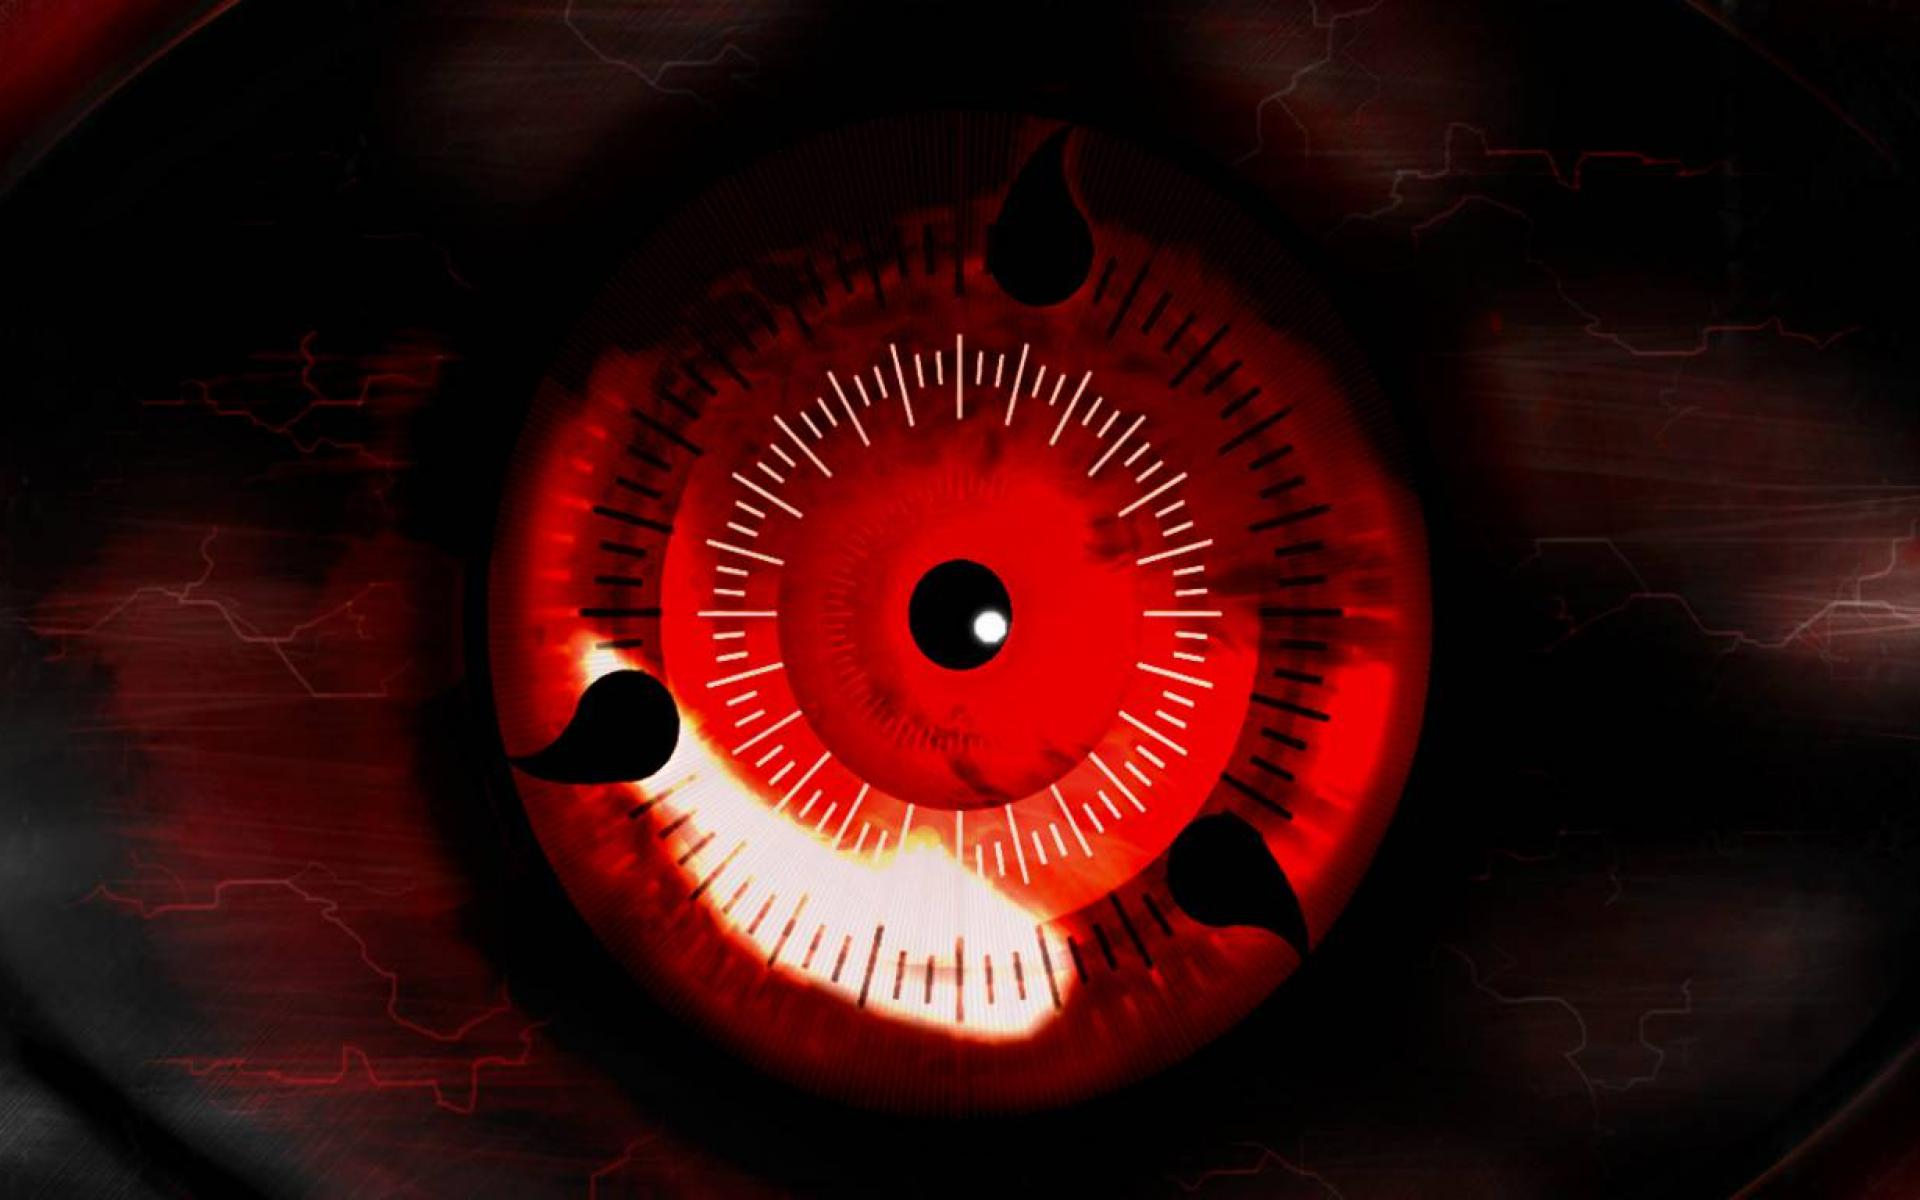 A19 Naruto sharingan eyes anime HD Desktop background wallpapers downloads